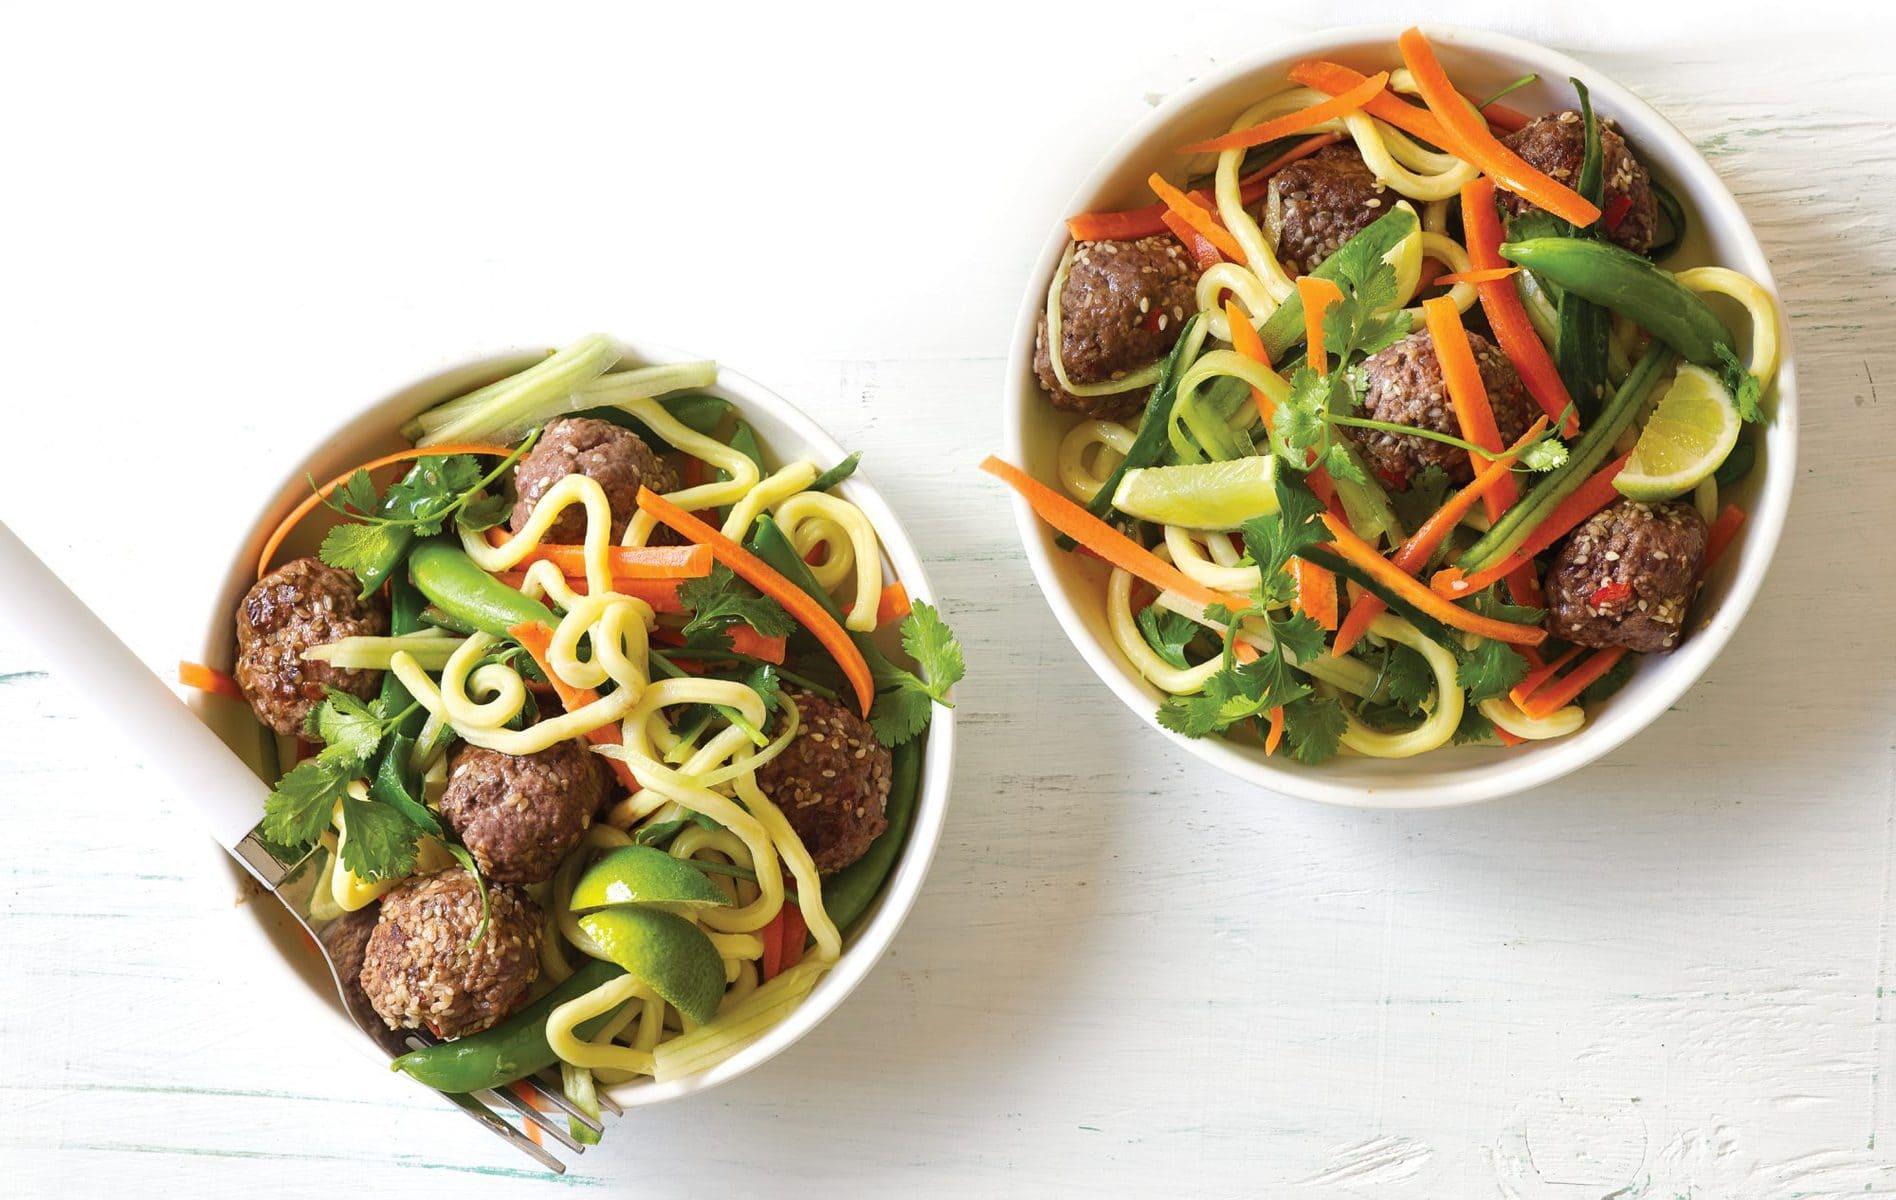 Thai meatball salad and sesame noodles